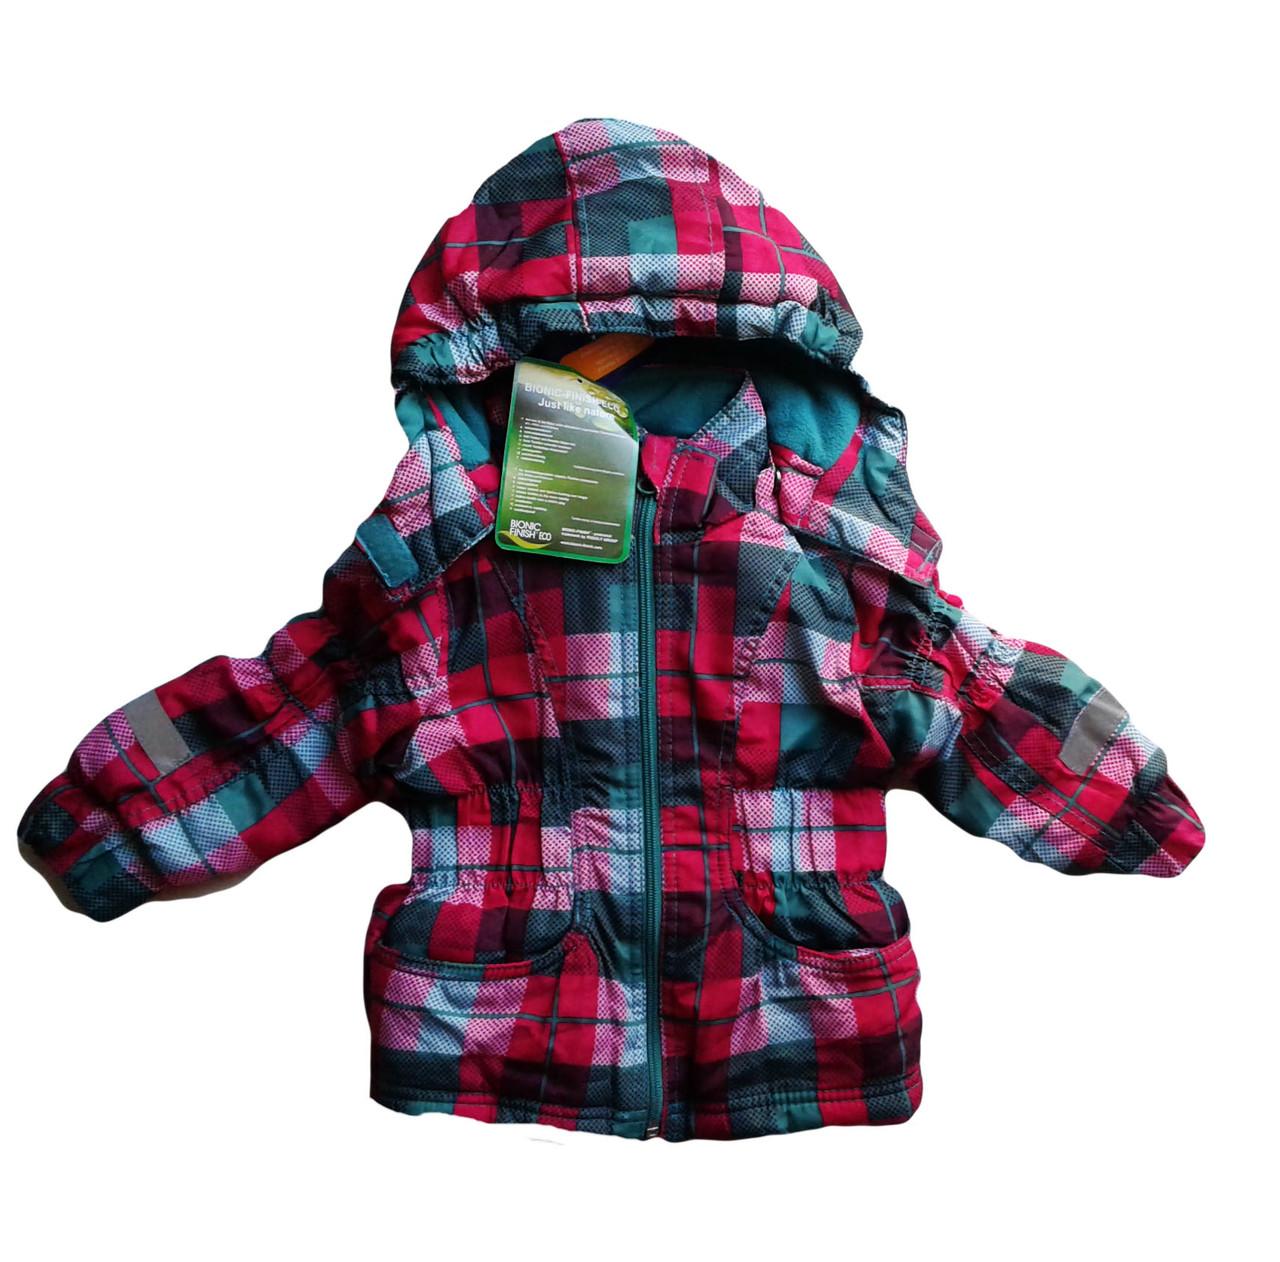 Куртка  для девочки, Lupilu, размер 86, арт. Л-414